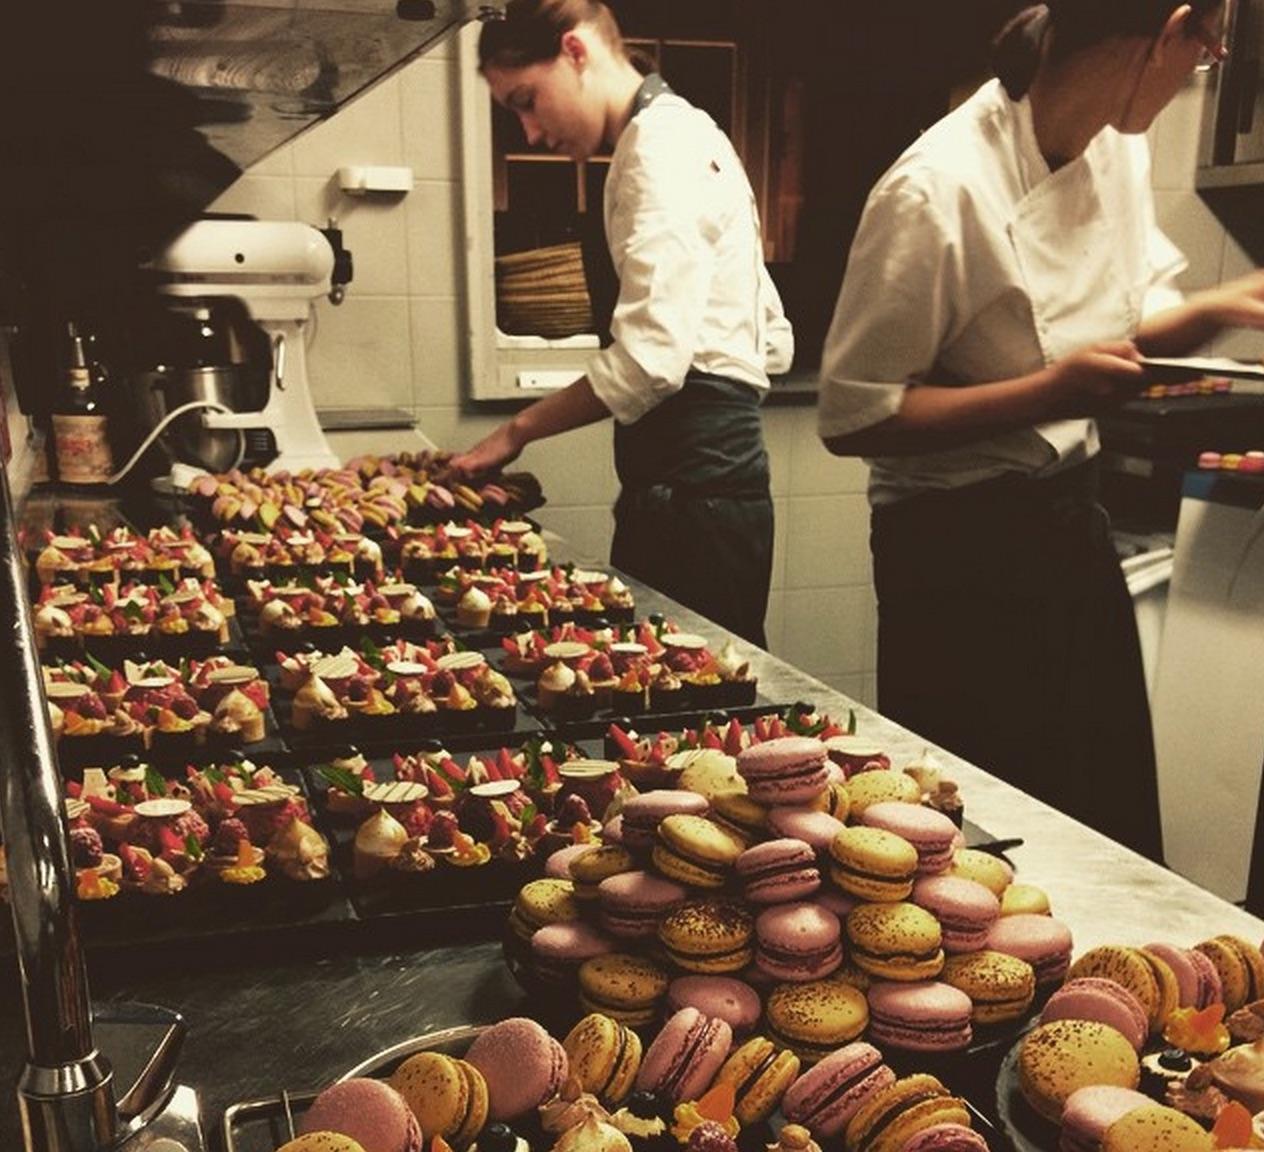 Brasserie les Haras, Strasbourg - Food 2 - Humphrey Munson Blog